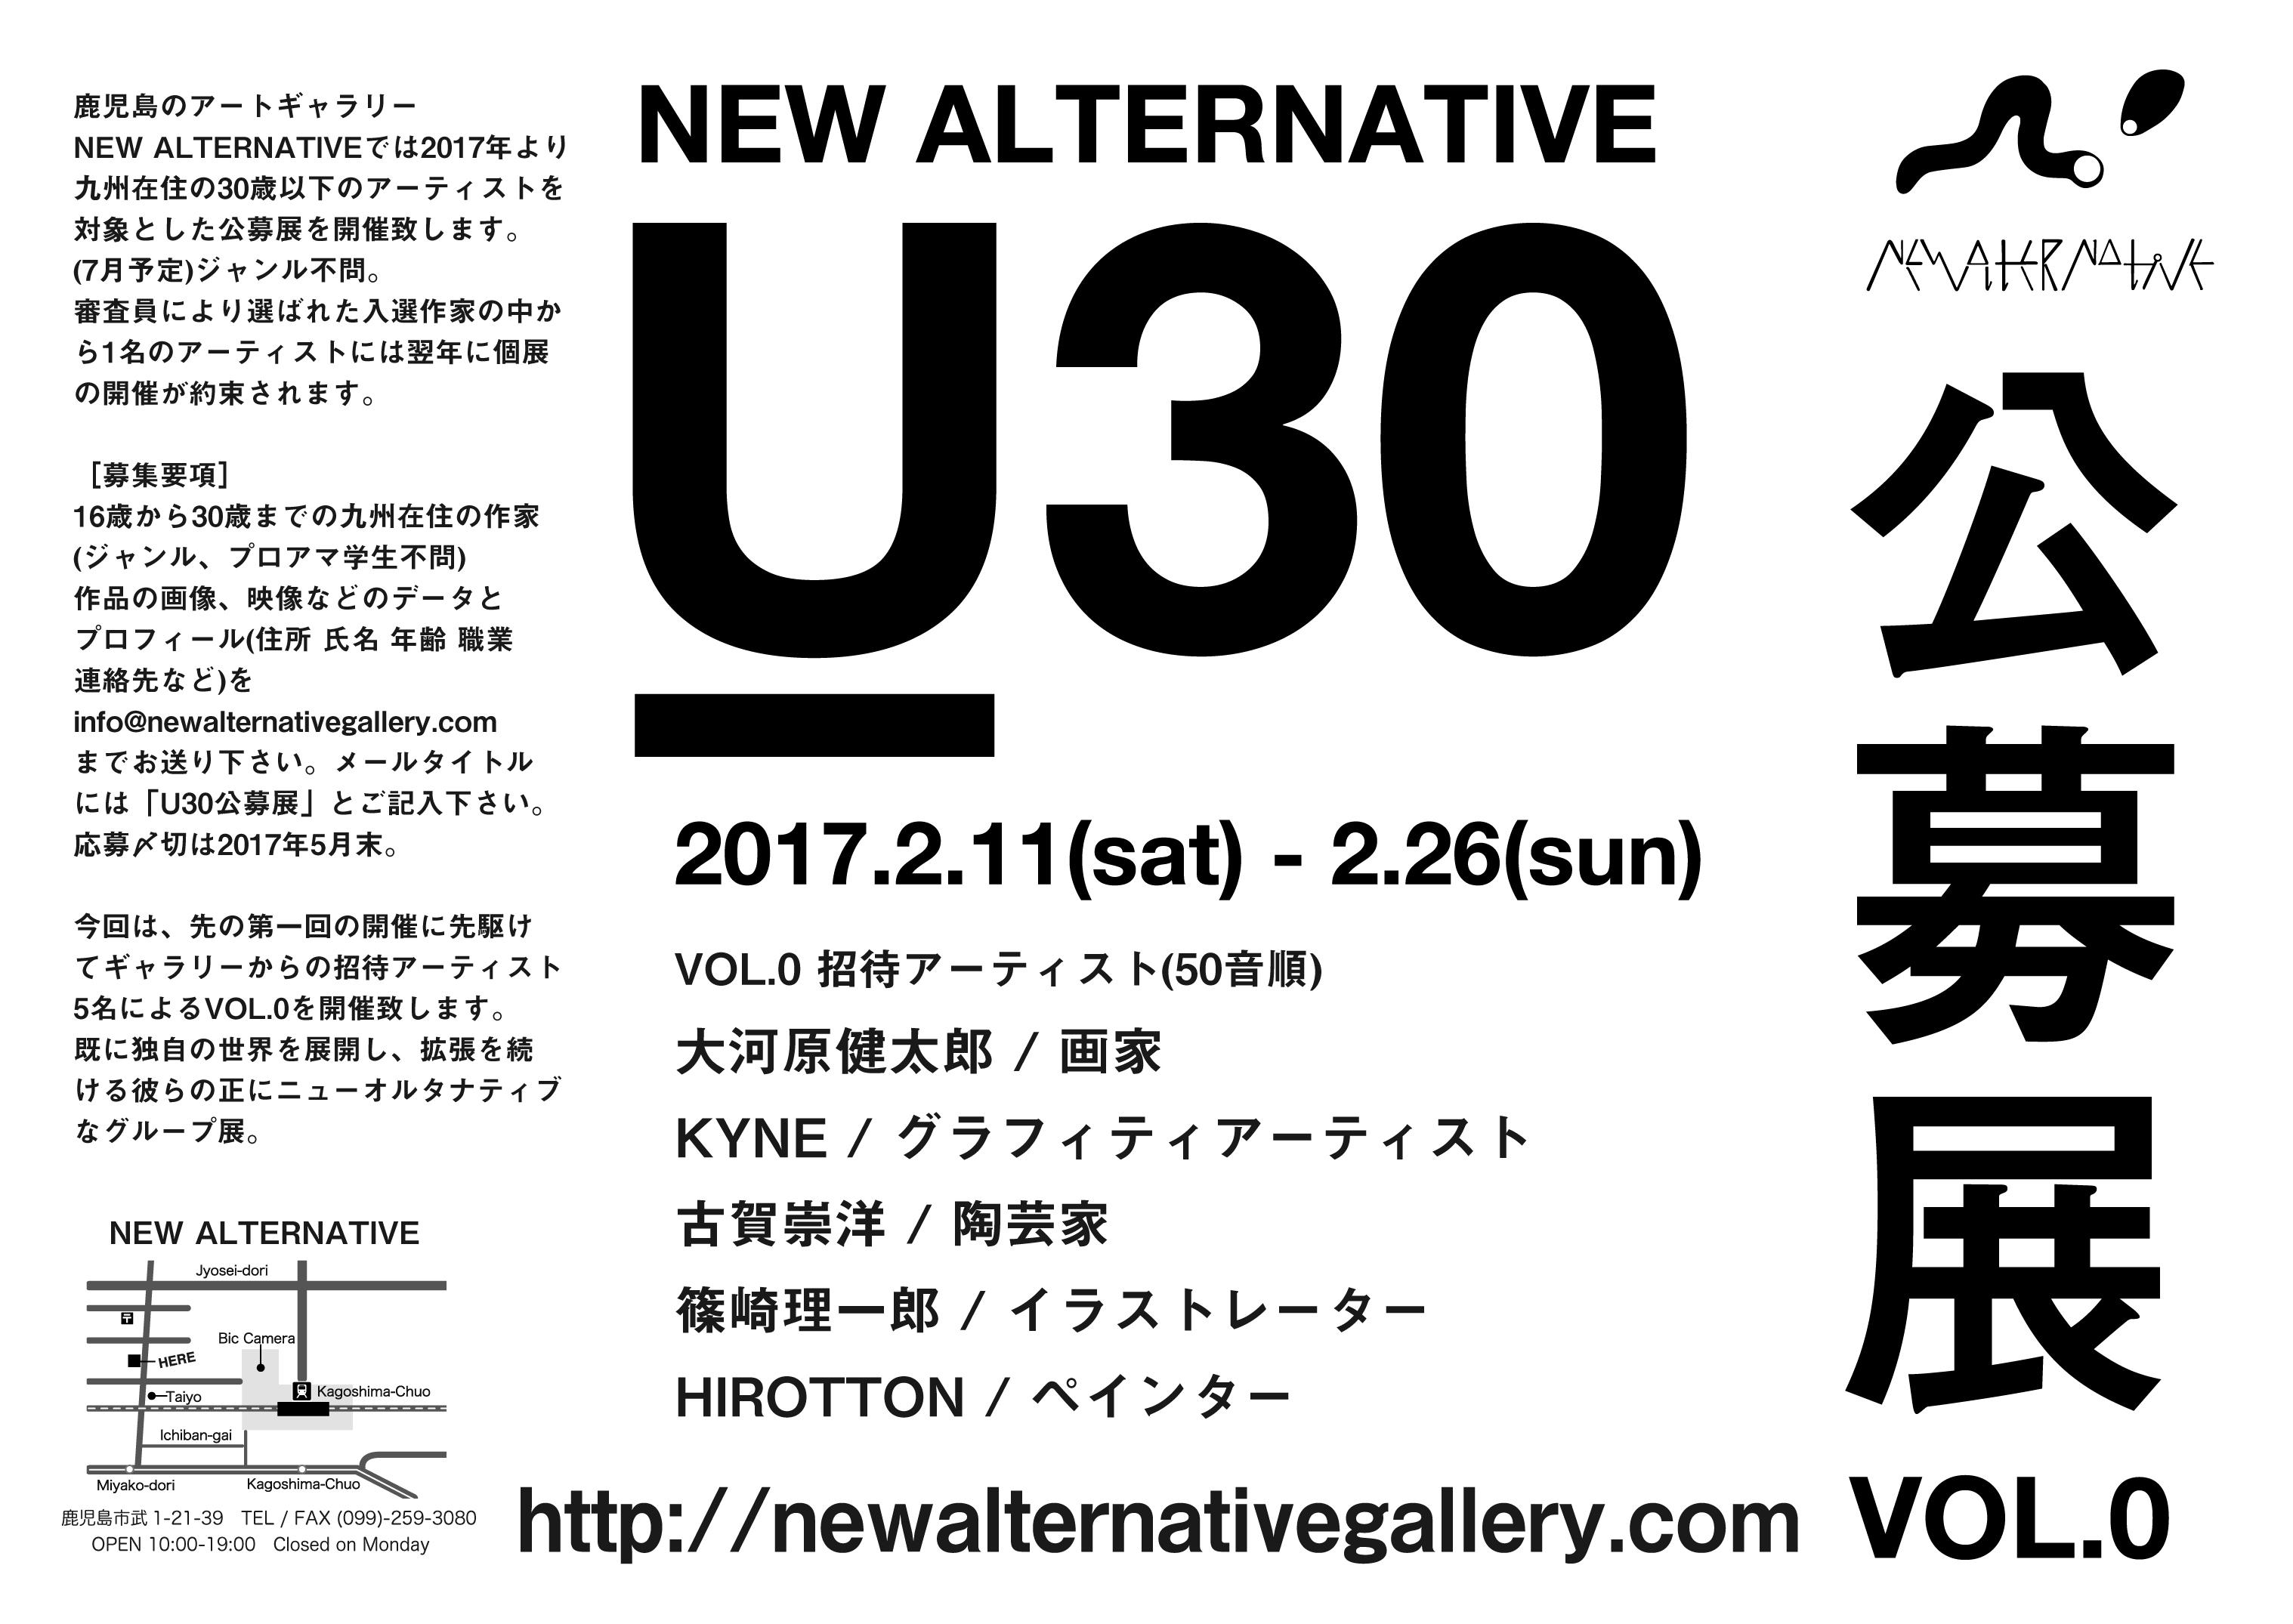 NEW ALTERNATIVE 【U30 公募展】VOL.0